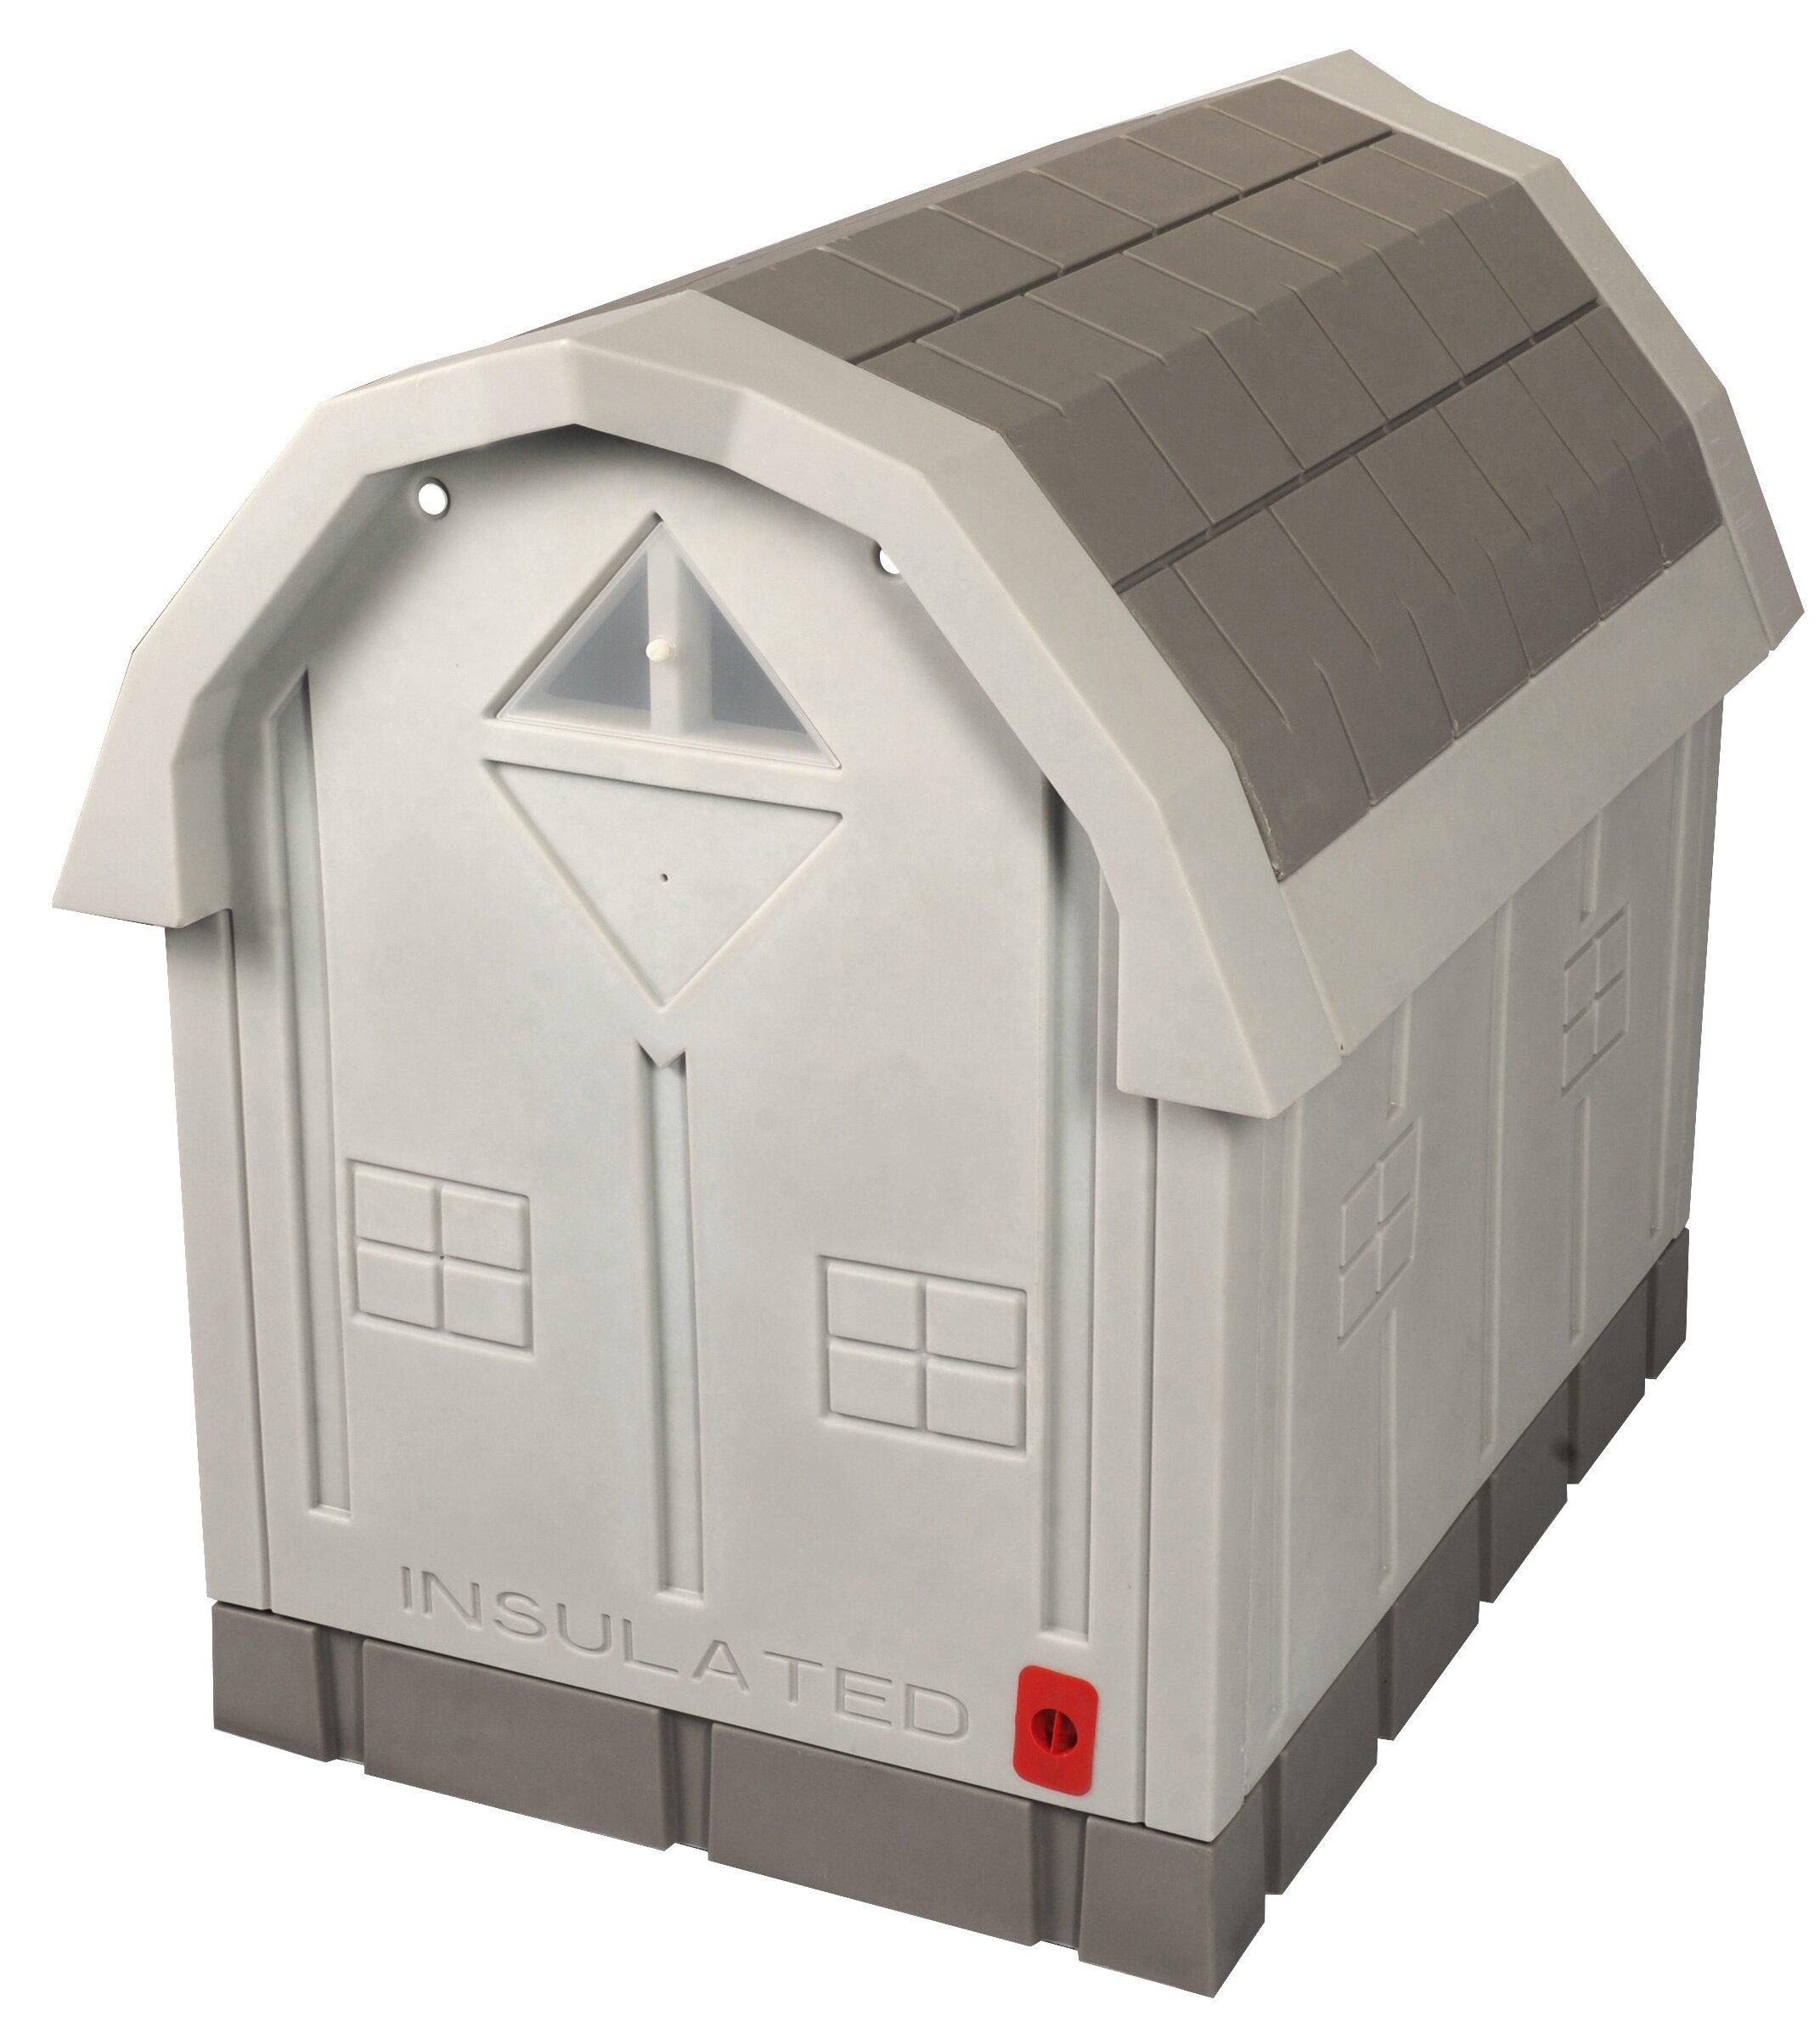 Dog Palace Premium Insulated Dog House With Heating Pad Wayfair